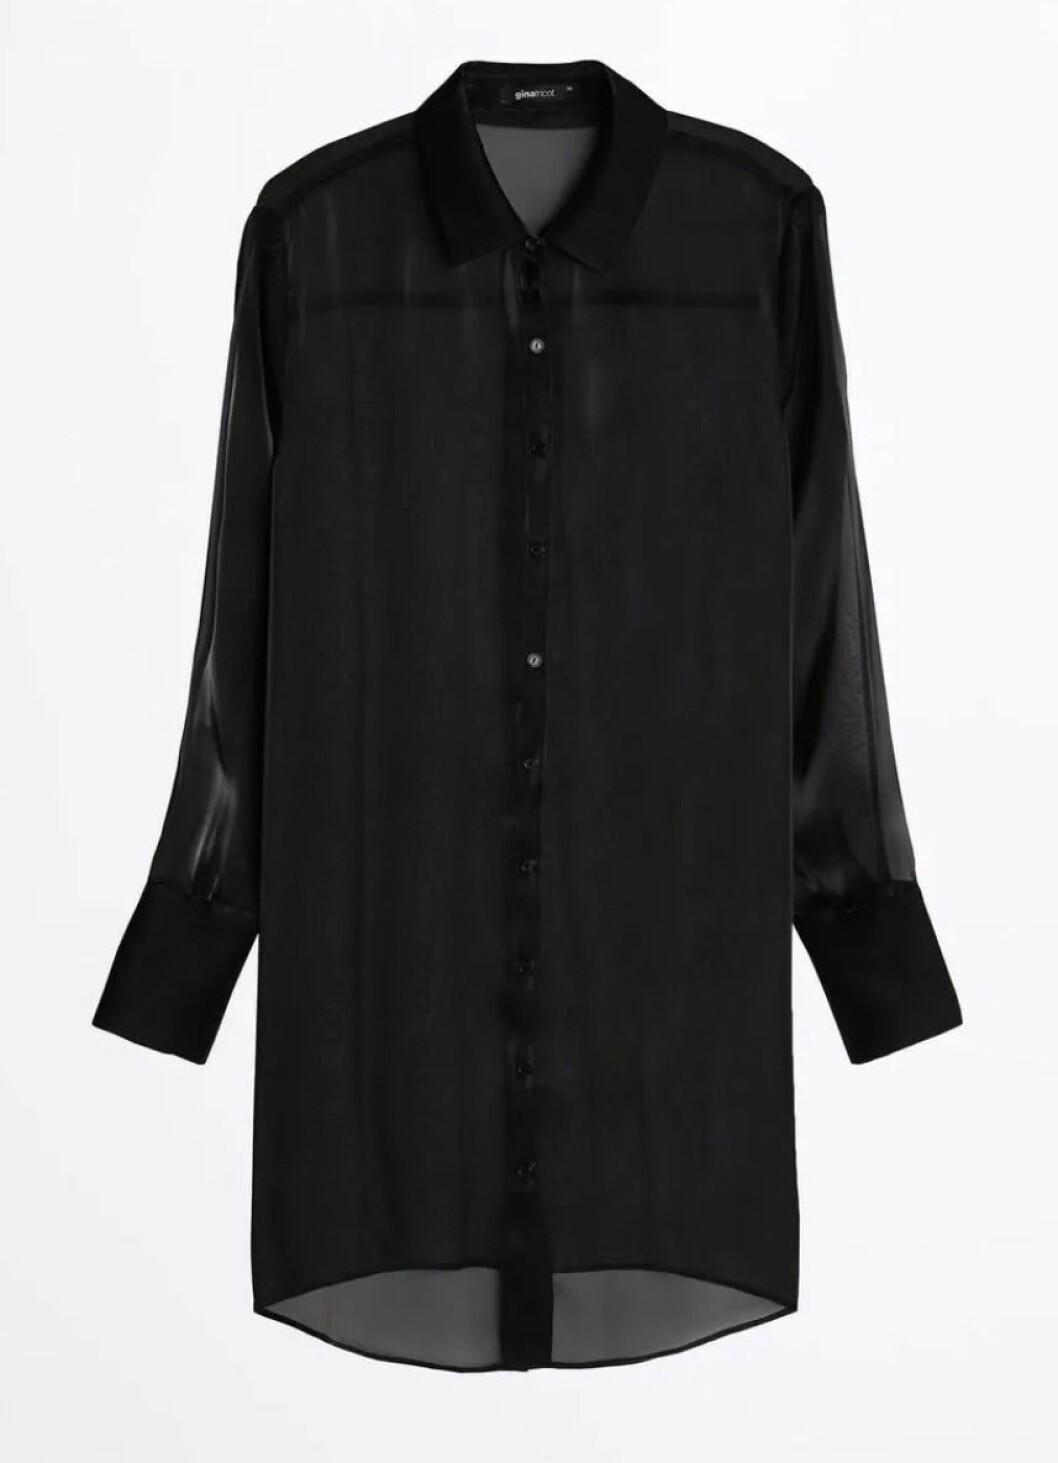 Svart skjorta i transparent tyg från Gina tricot